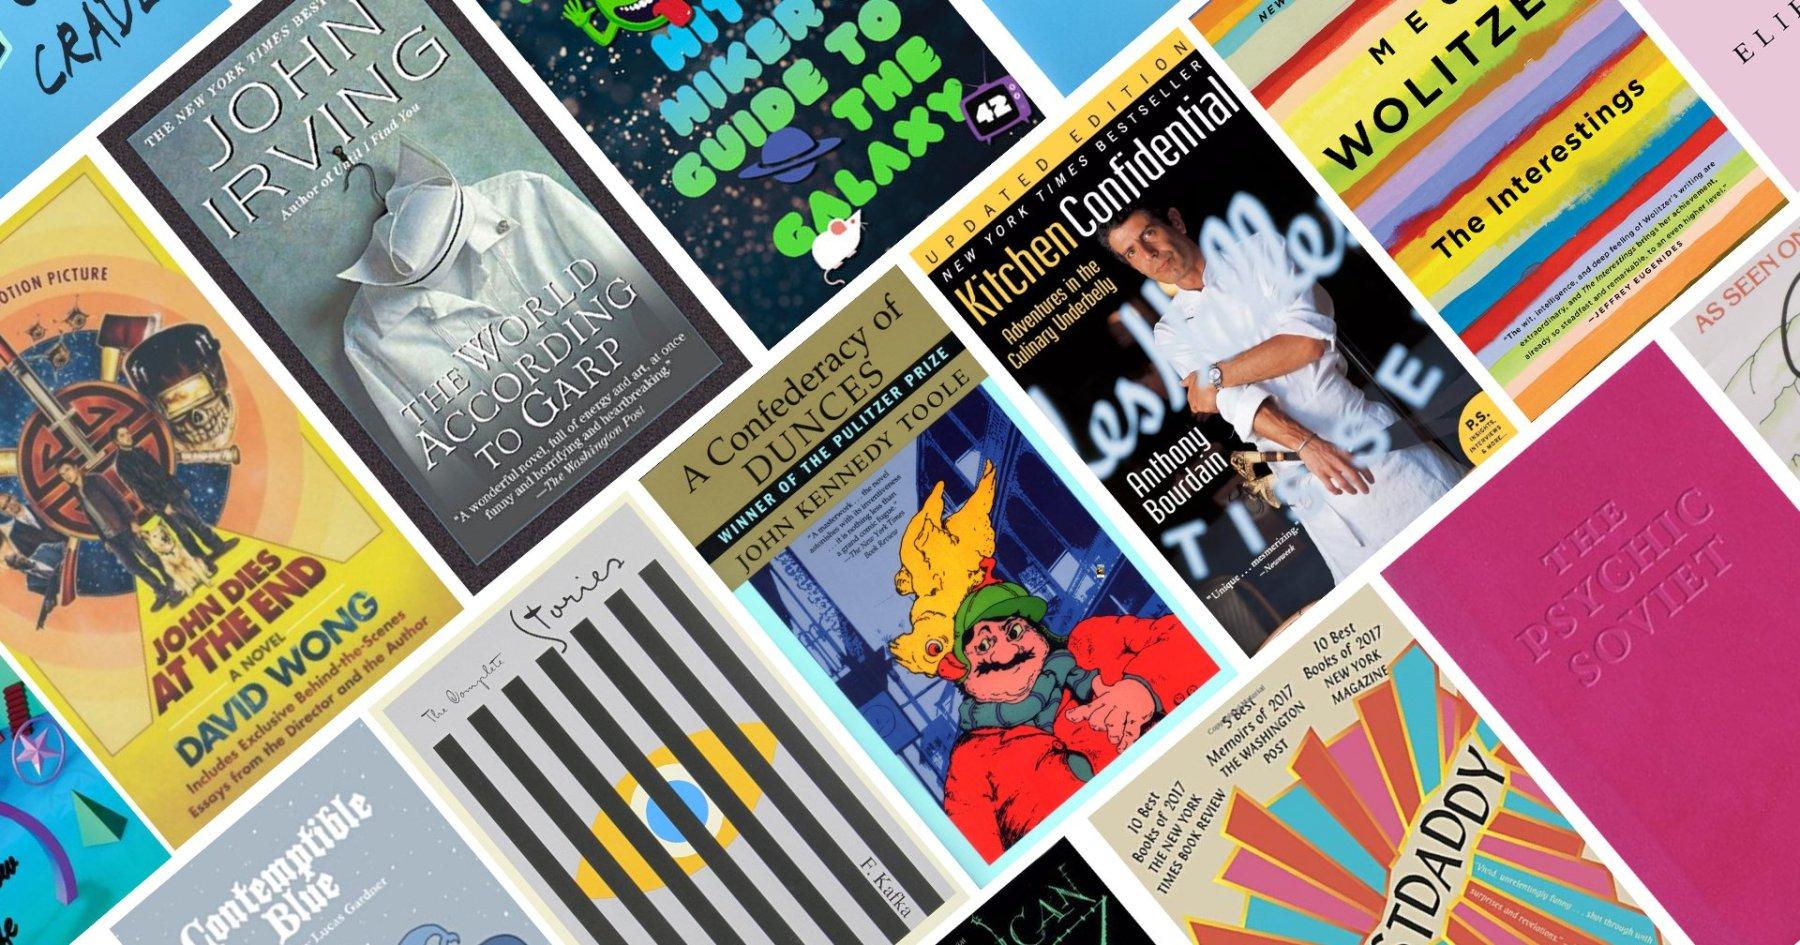 25 Hilarious Books - InsideHook